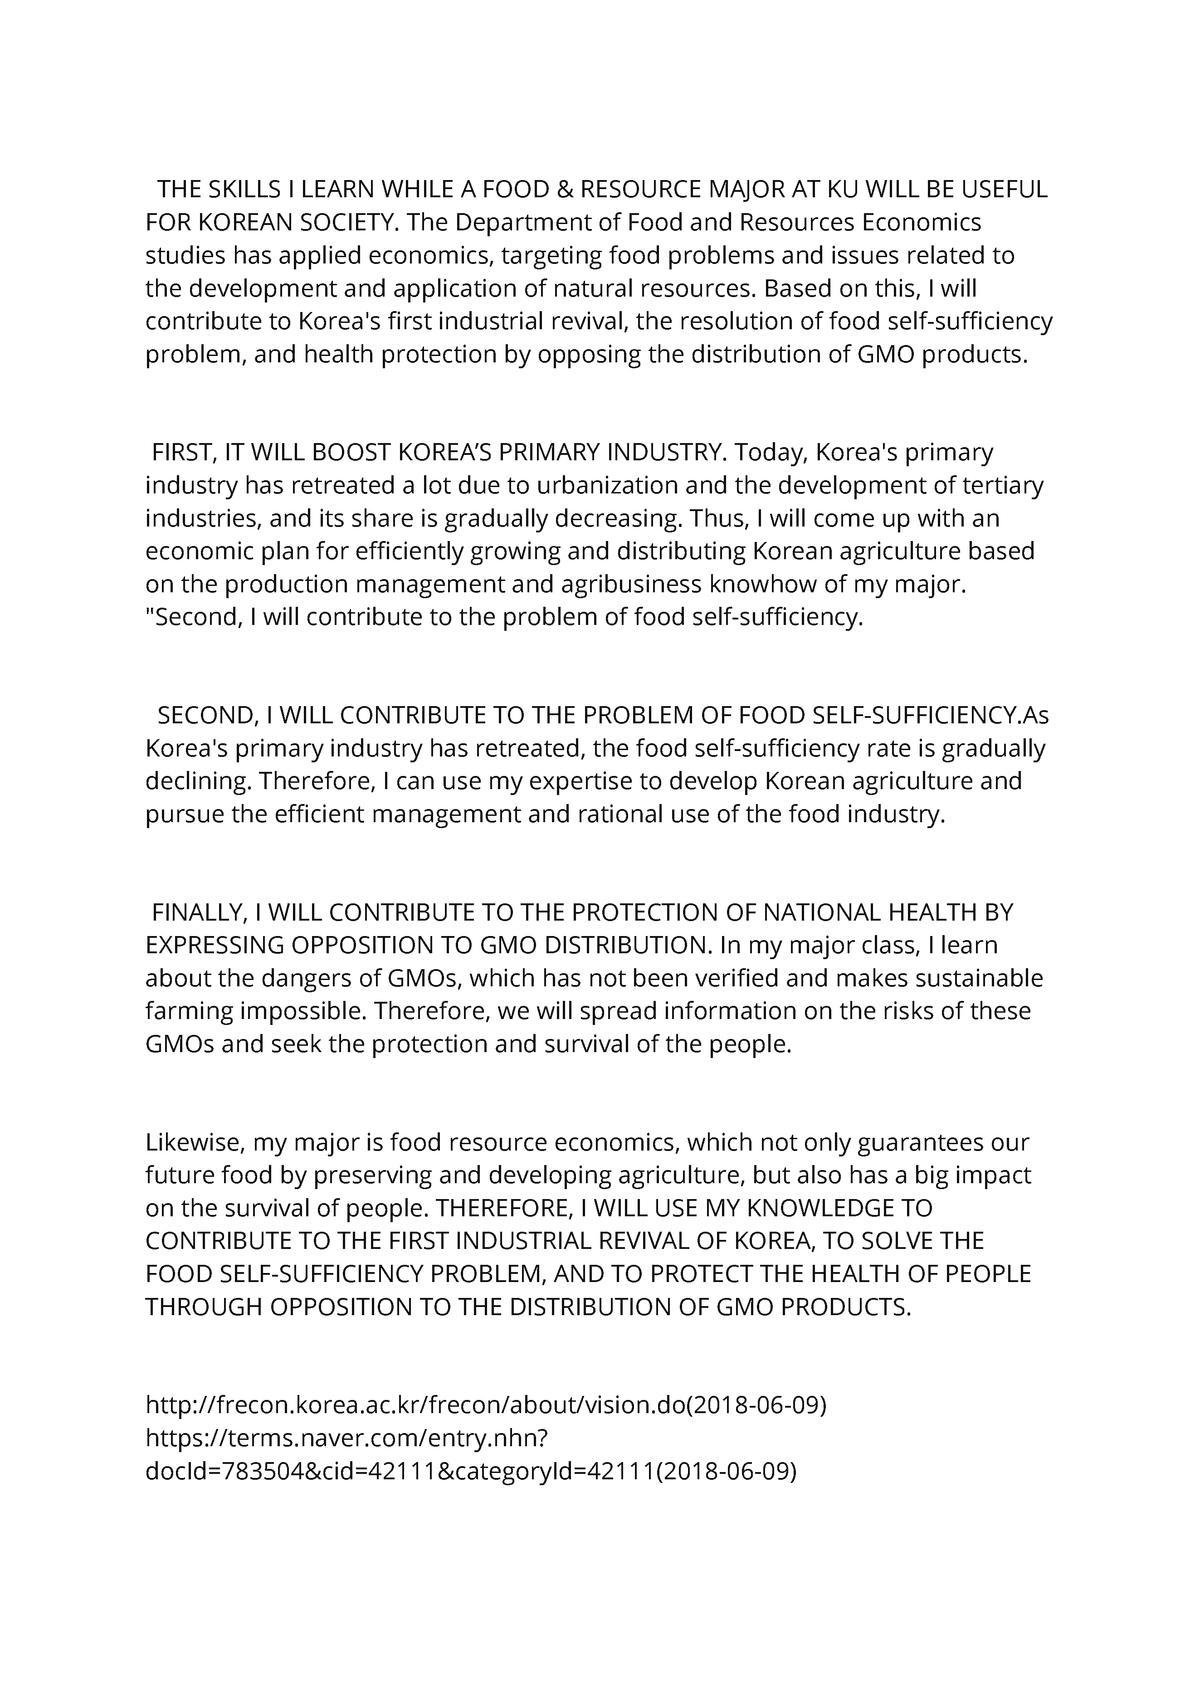 Opinion Essay how my major will be useful for Korea - IFLS003